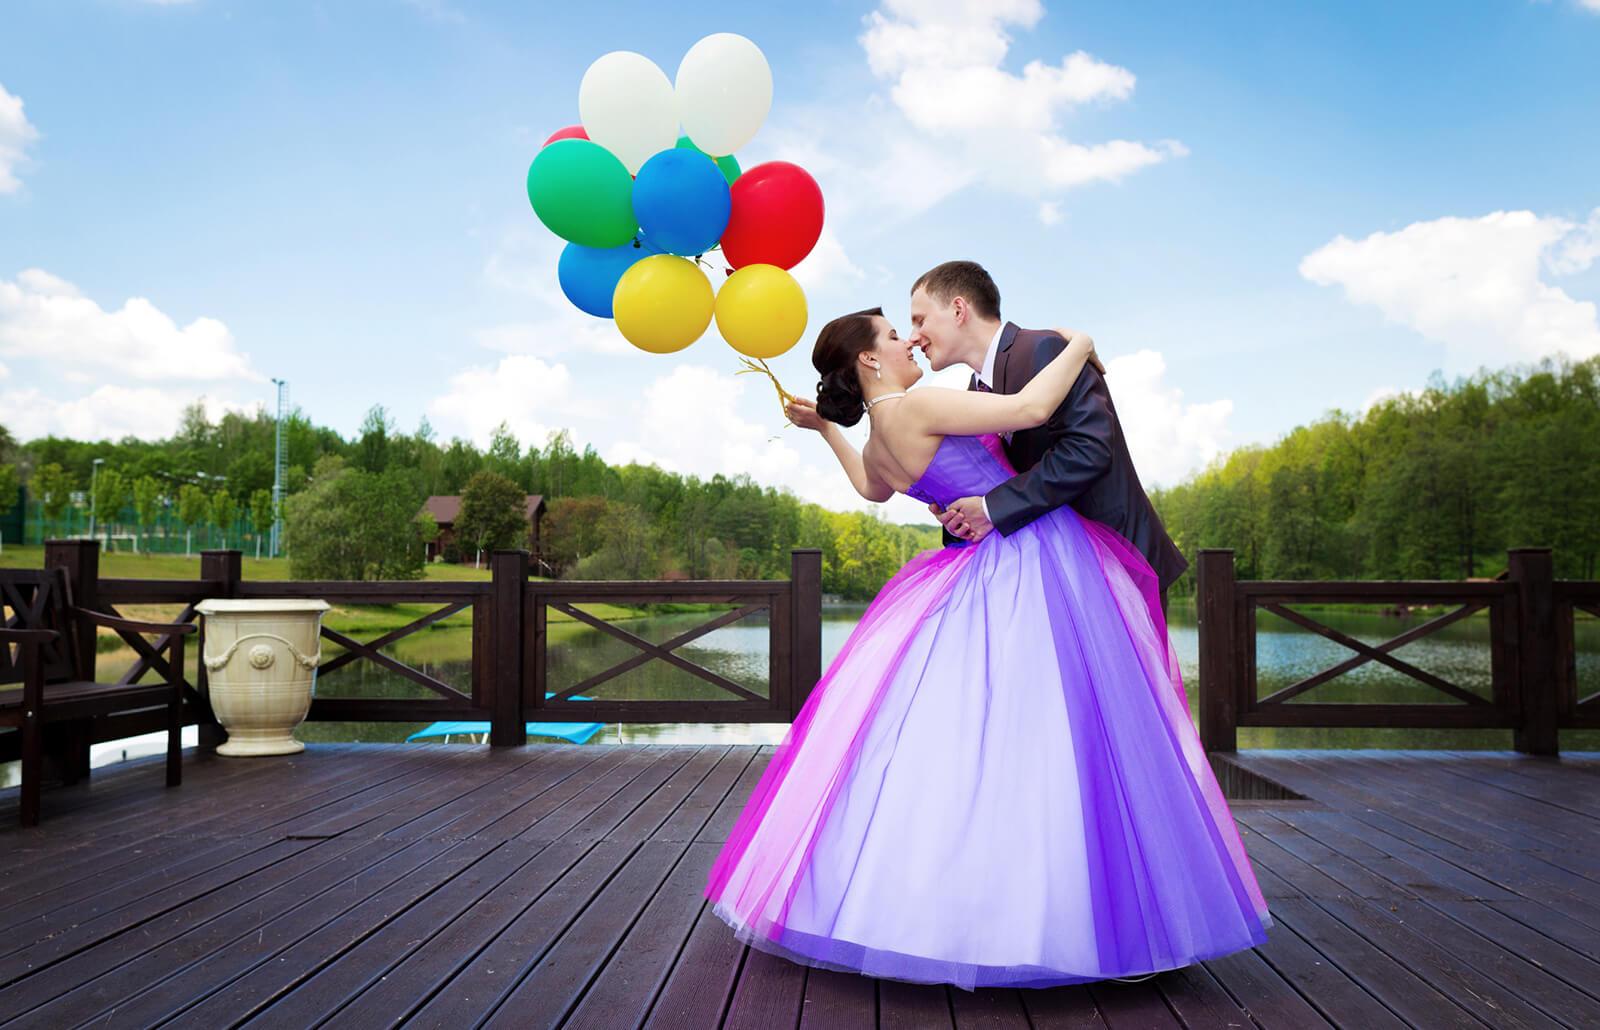 Summer Wedding Themes | LoveToKnow